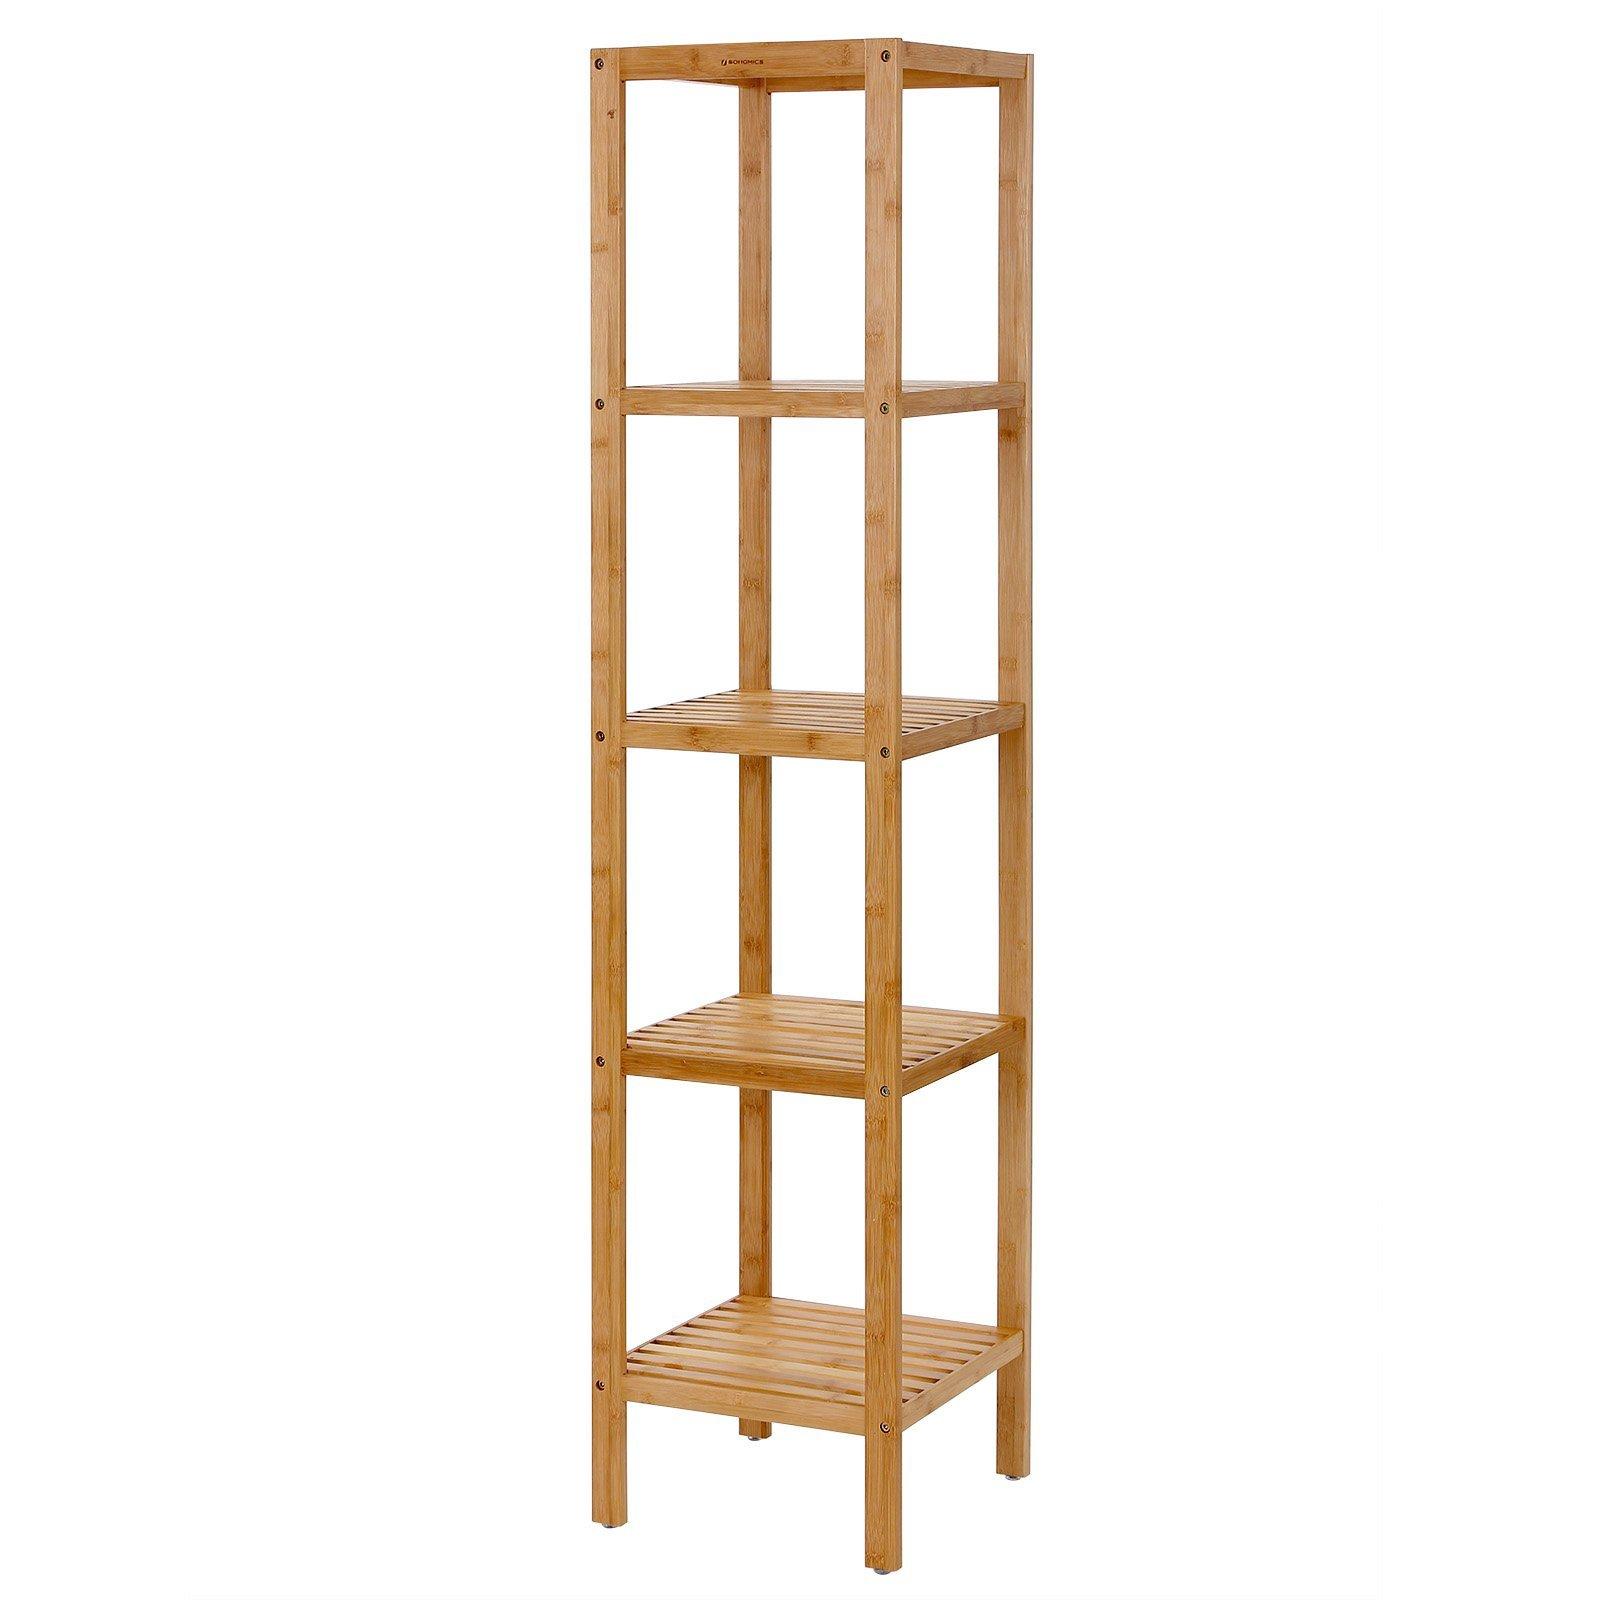 SONGMICS 100% 5-Tier Bamboo Bathroom Shelf, Narrow Shelving Unit, Multifunctional Storage Rack, Wood Corner Rack, for Kitchen, Livingroom, Bedroom, Hallway Natural UBCB55Y by SONGMICS